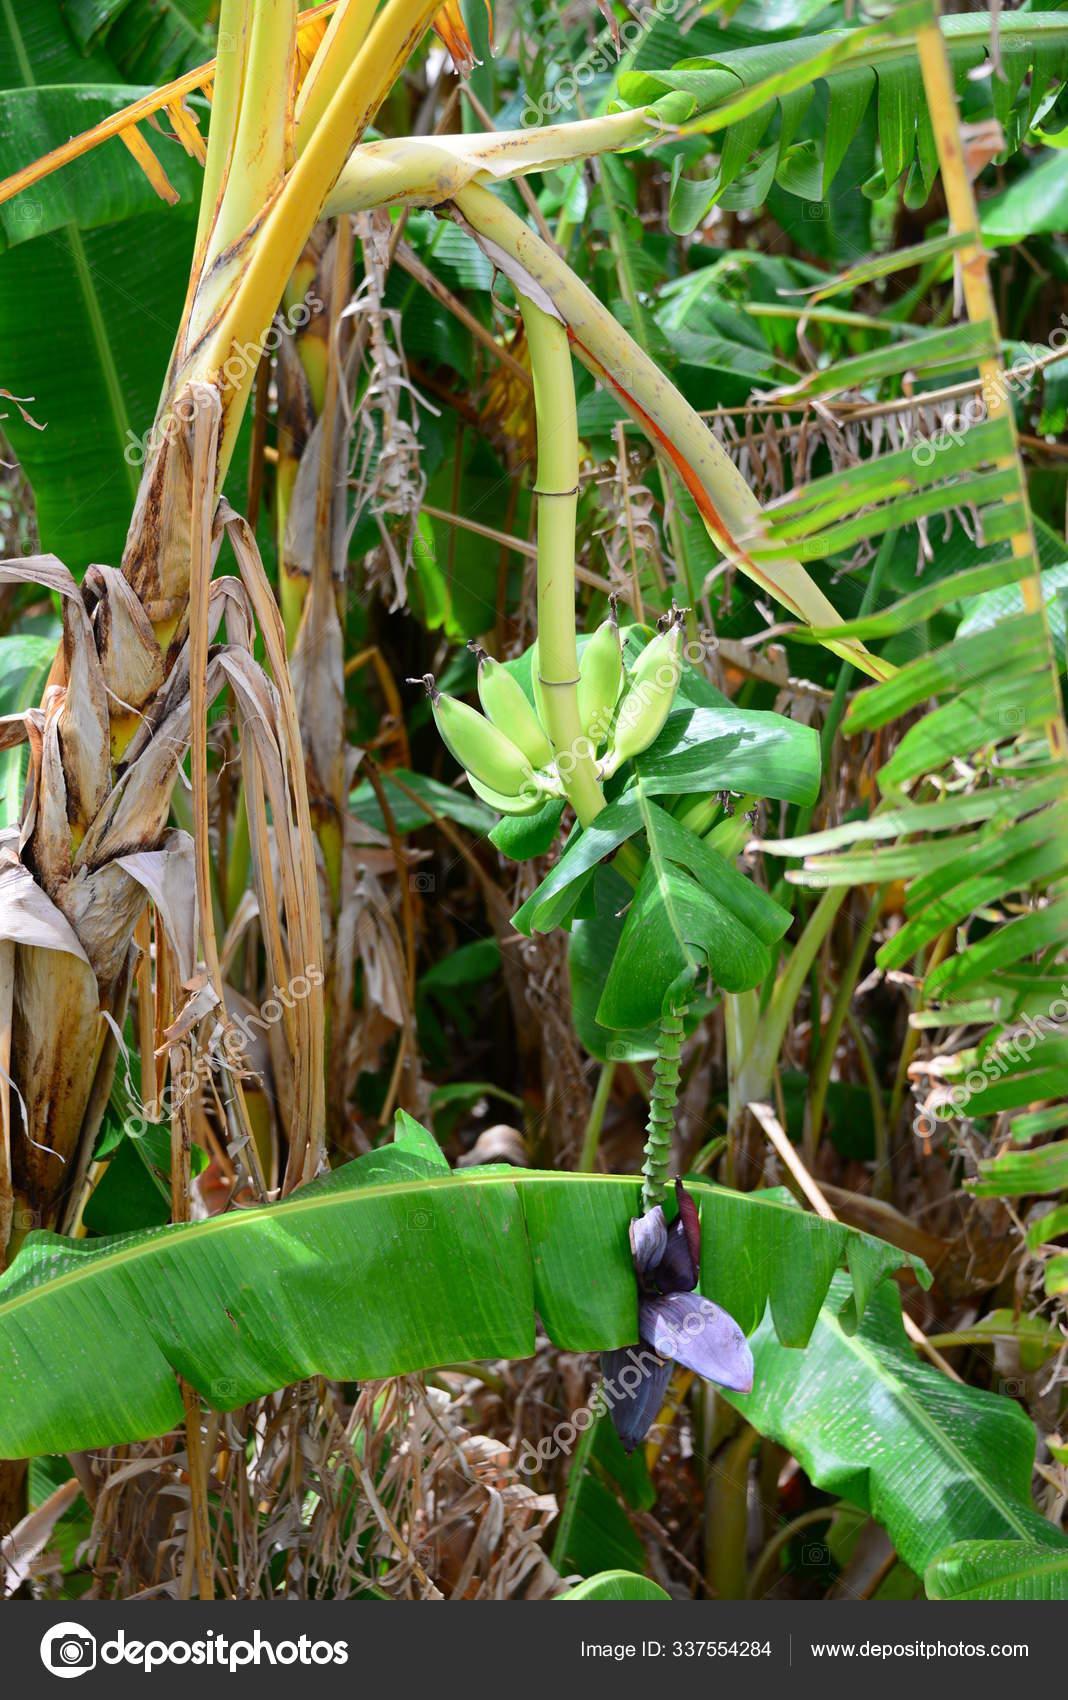 Pohon Pisang Kebun Daun Tanaman Dan Buah Buahan Stok Foto C Panthermediaseller 337554284